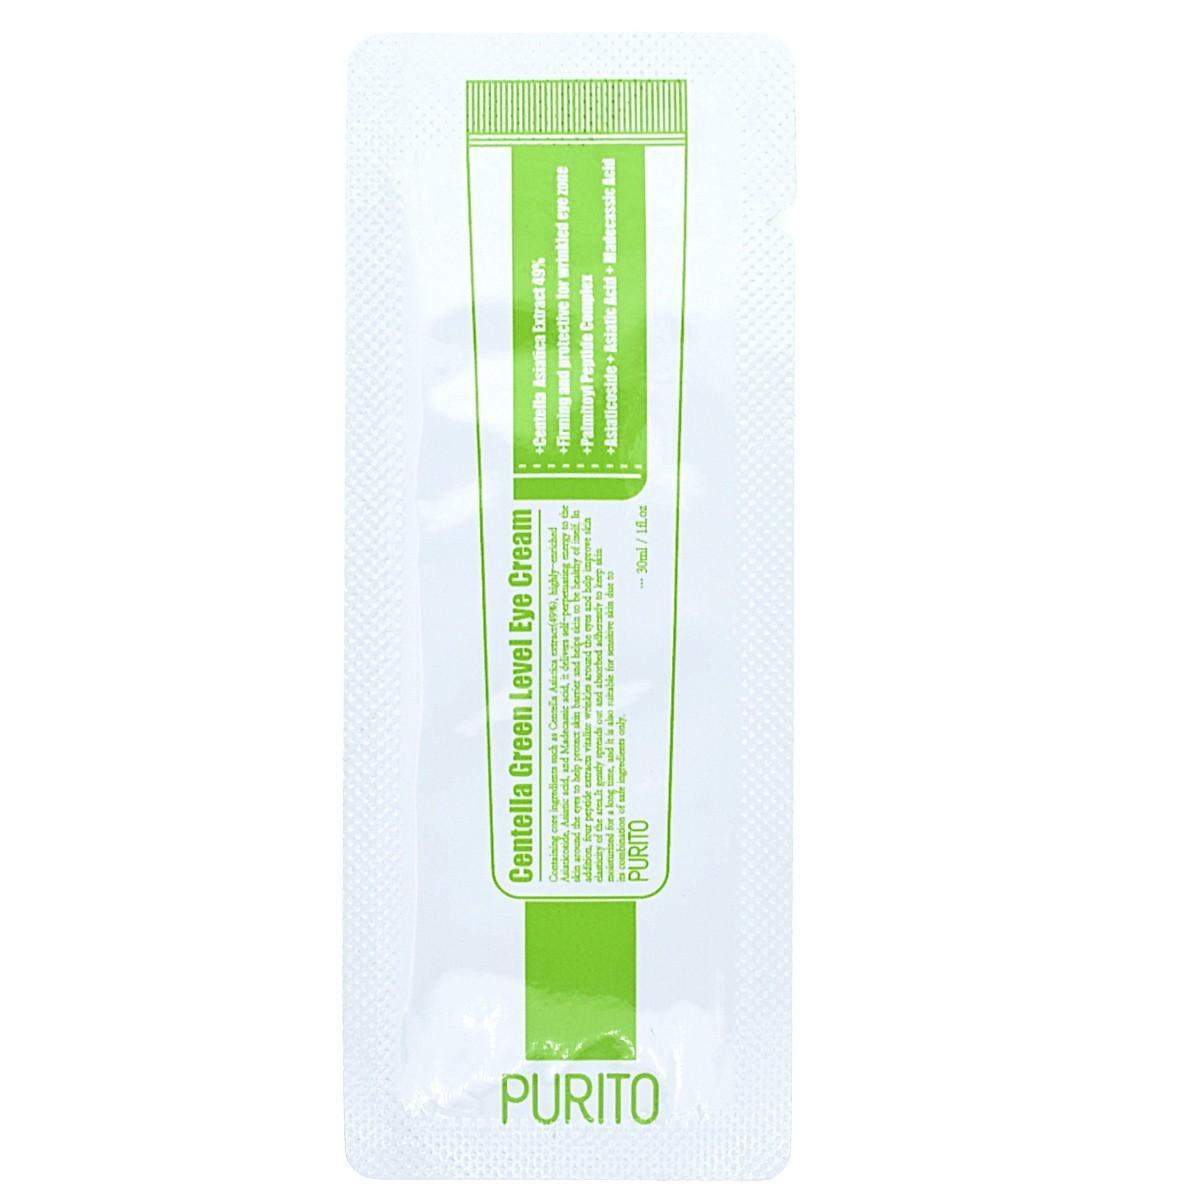 Кремы для лица Крем для лица PURITO Centella Green Level Recovery Cream (sample) 55e15c678fc7b8315b5b6b051e4ac3b2.jpg